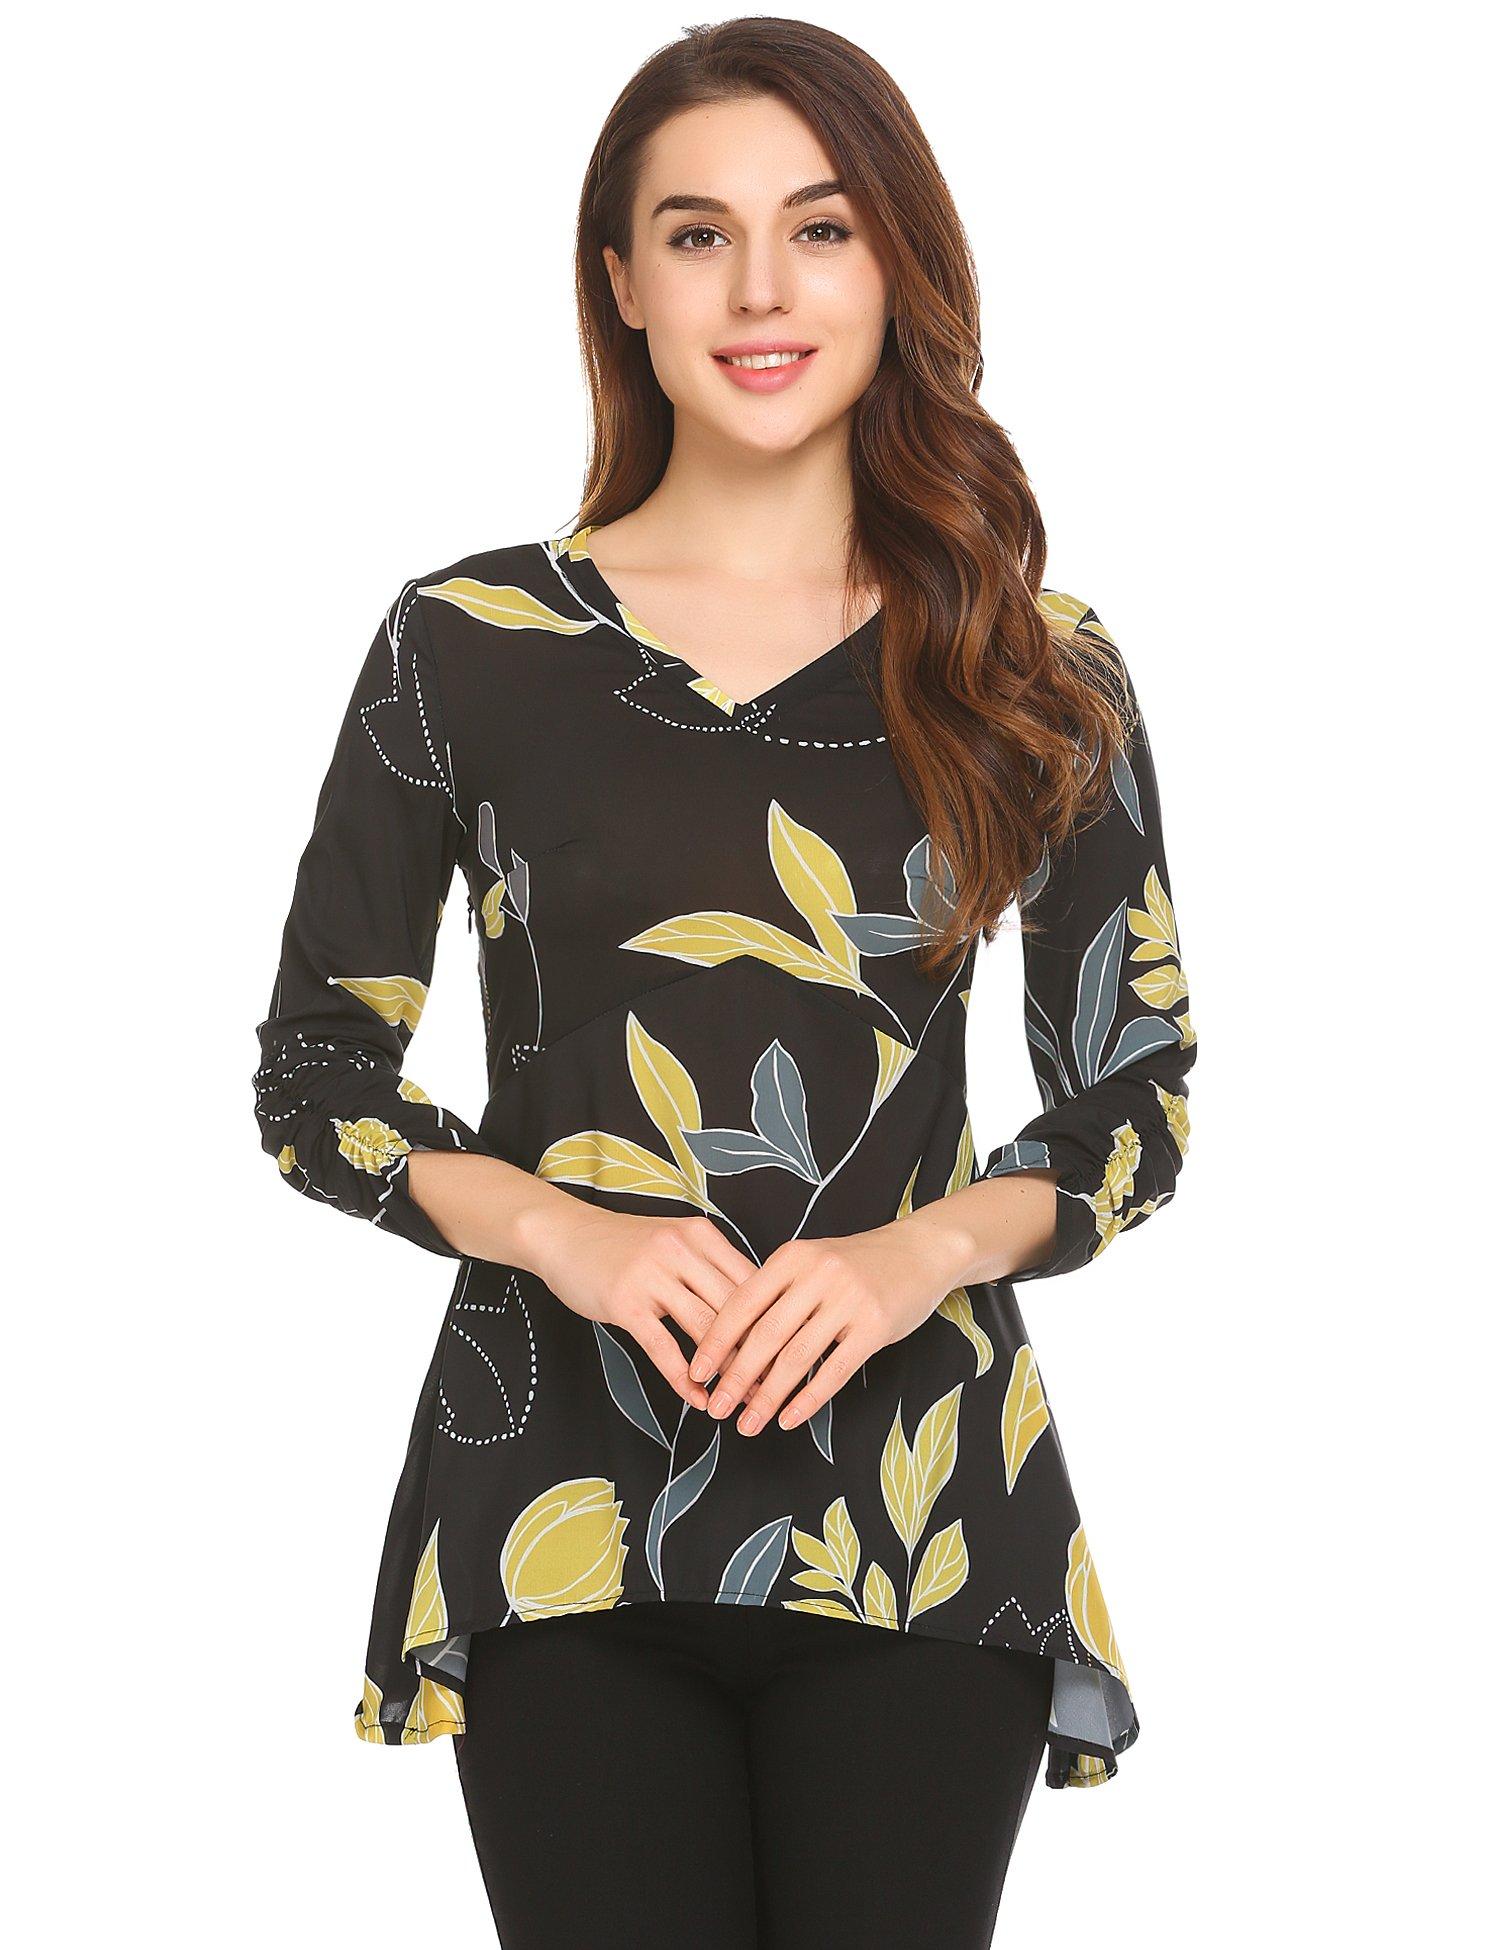 Venens women's tunic